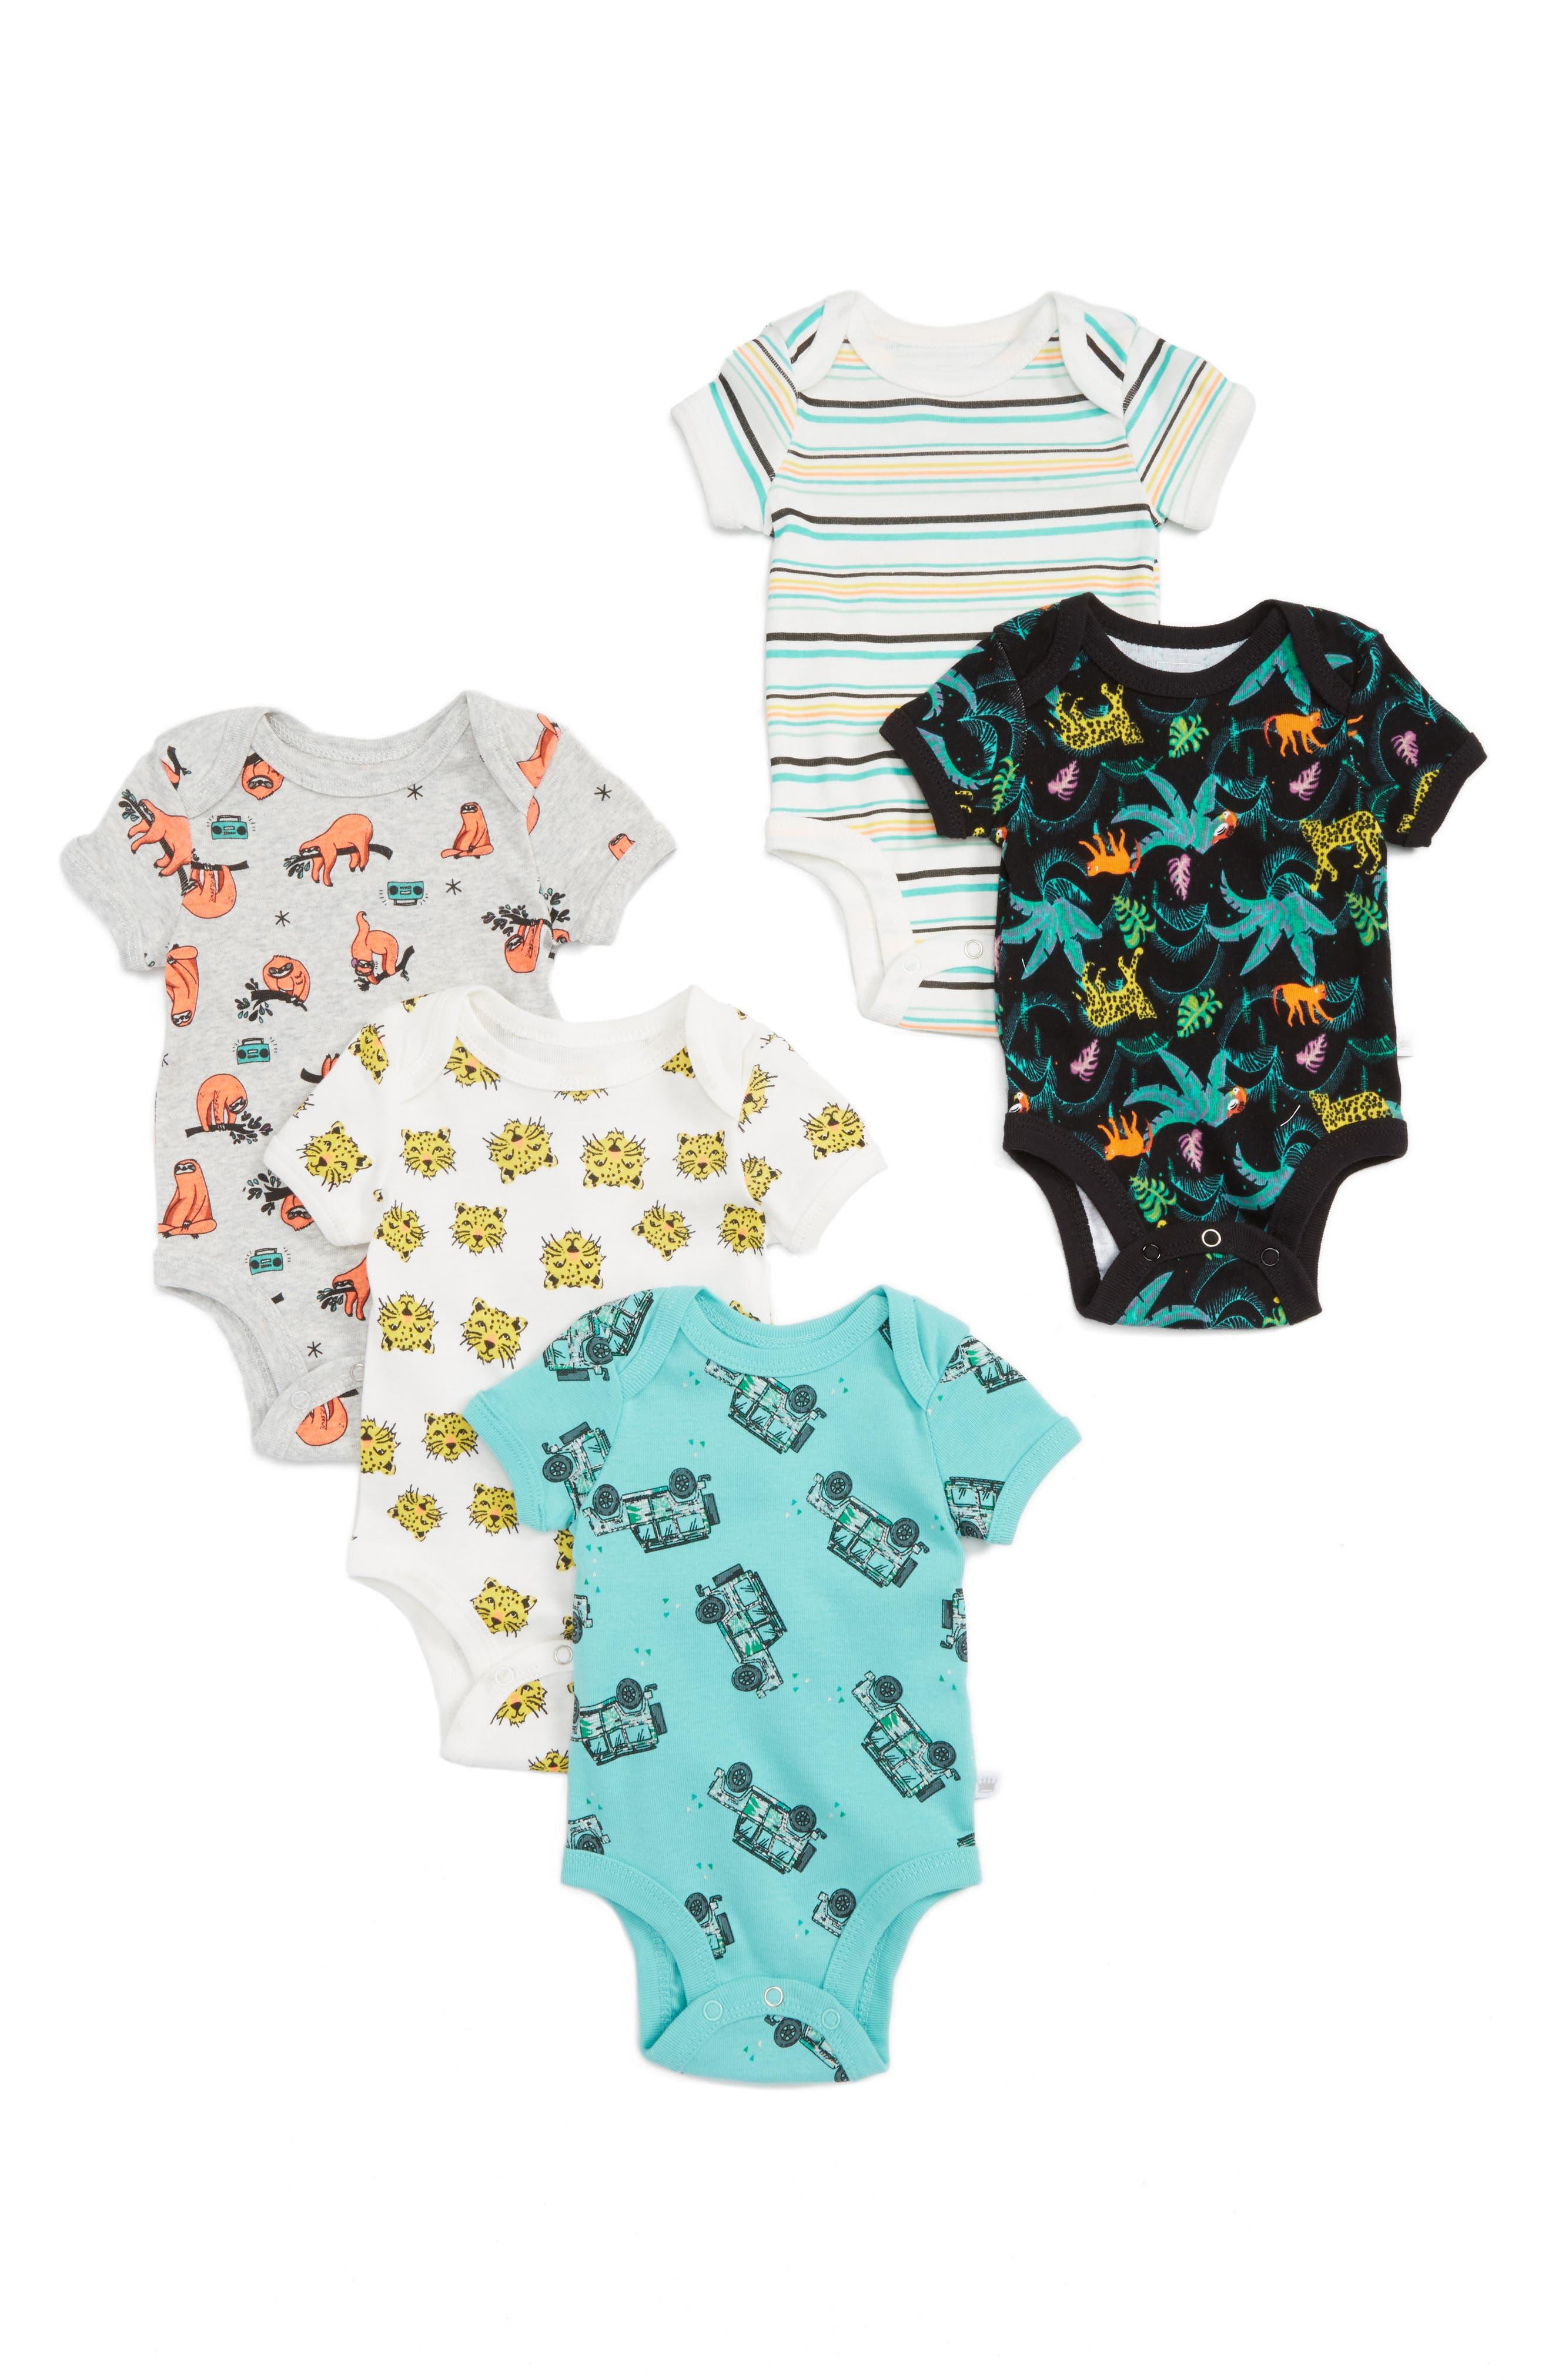 Rosie Pope Safari 5-Pack Bodysuits (Baby)